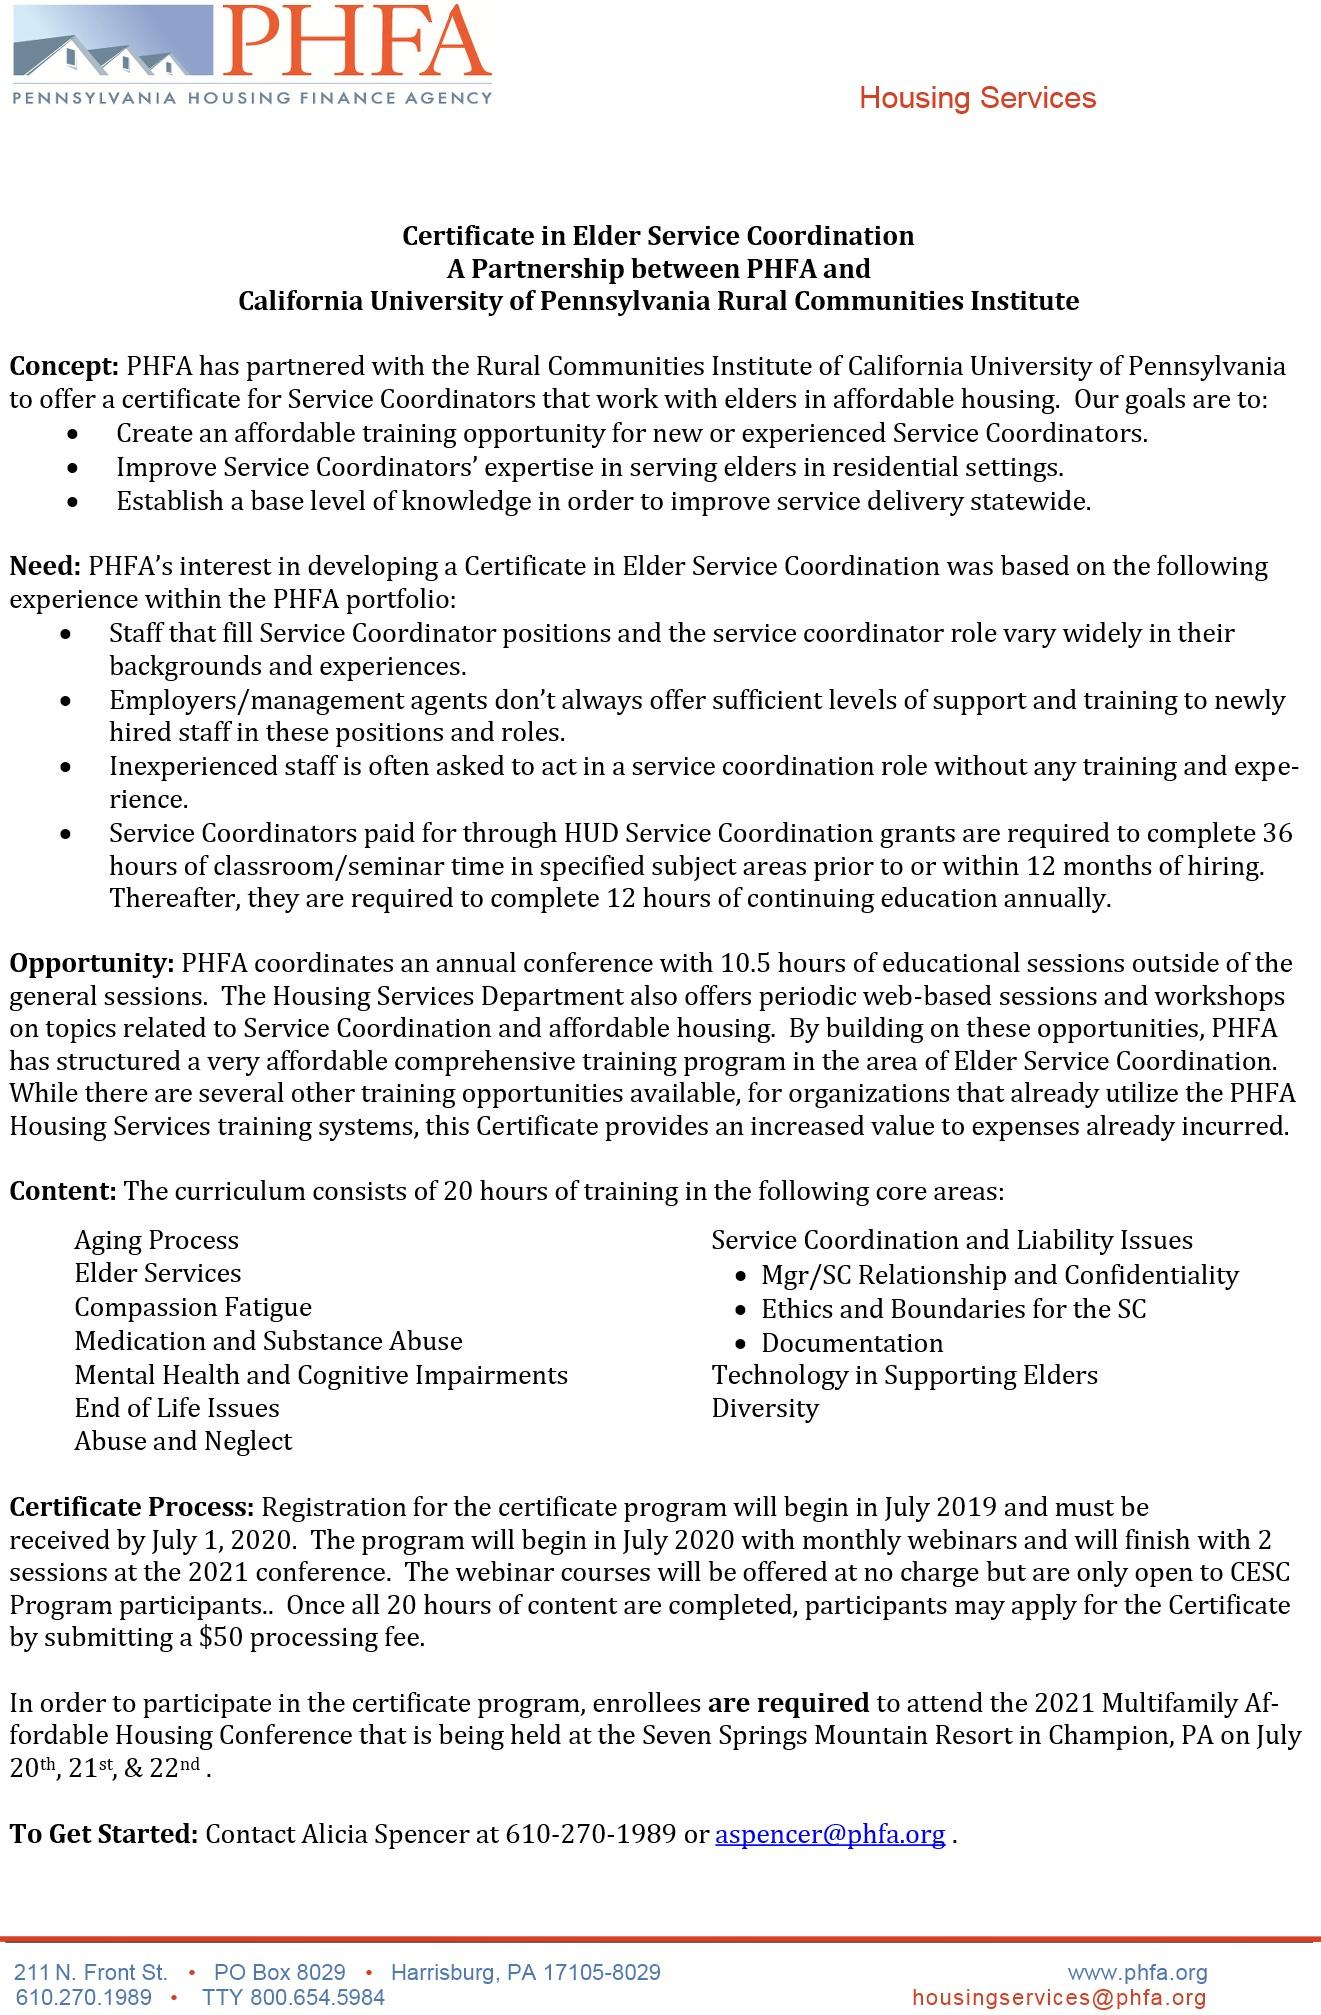 PHFA 2020 CESC Information Updated